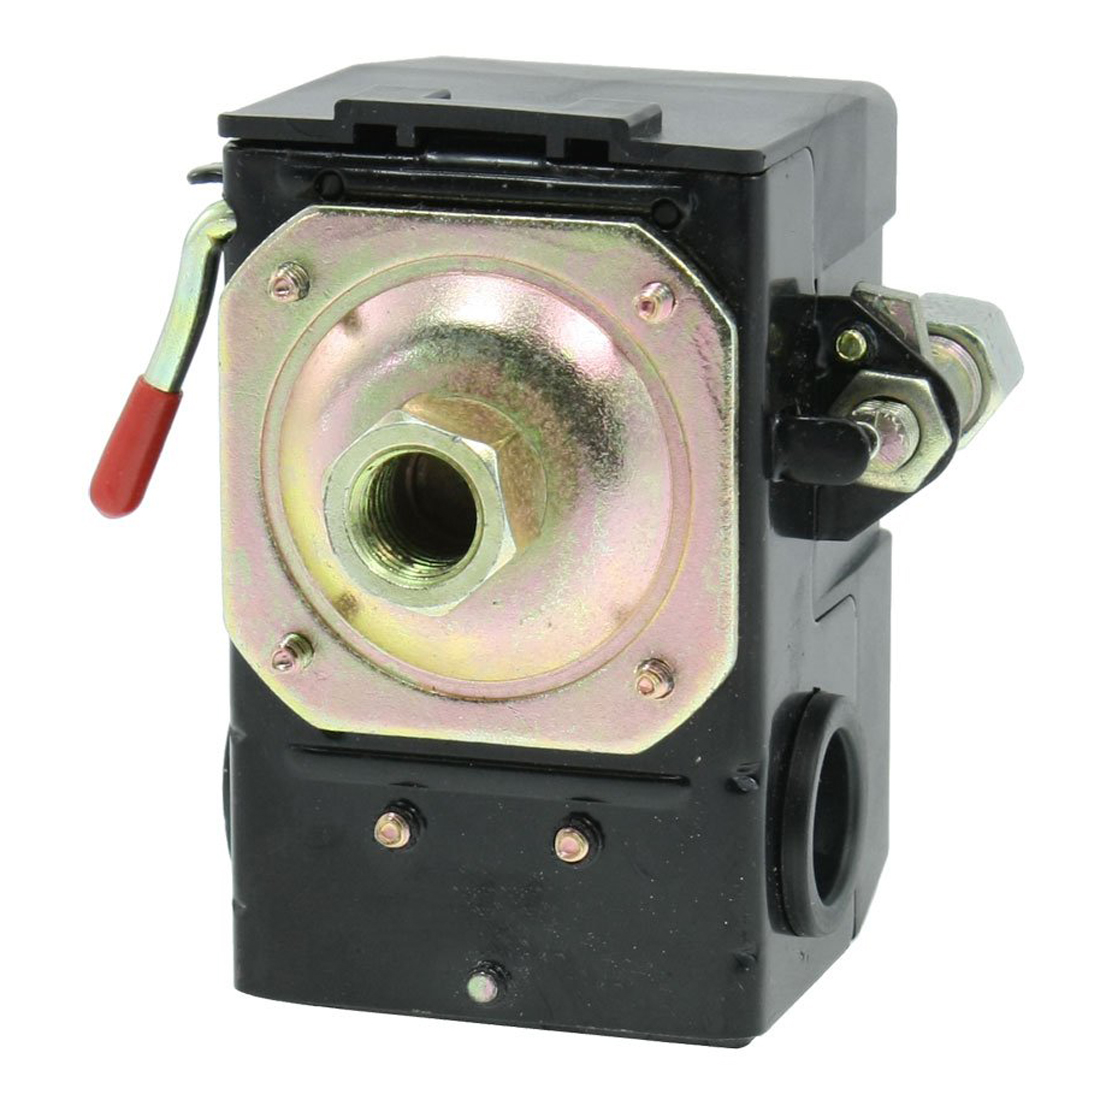 MYLB-80-115PSI 1/4 NPT 1-Port Air Compressor Pressure Switch Control Valve